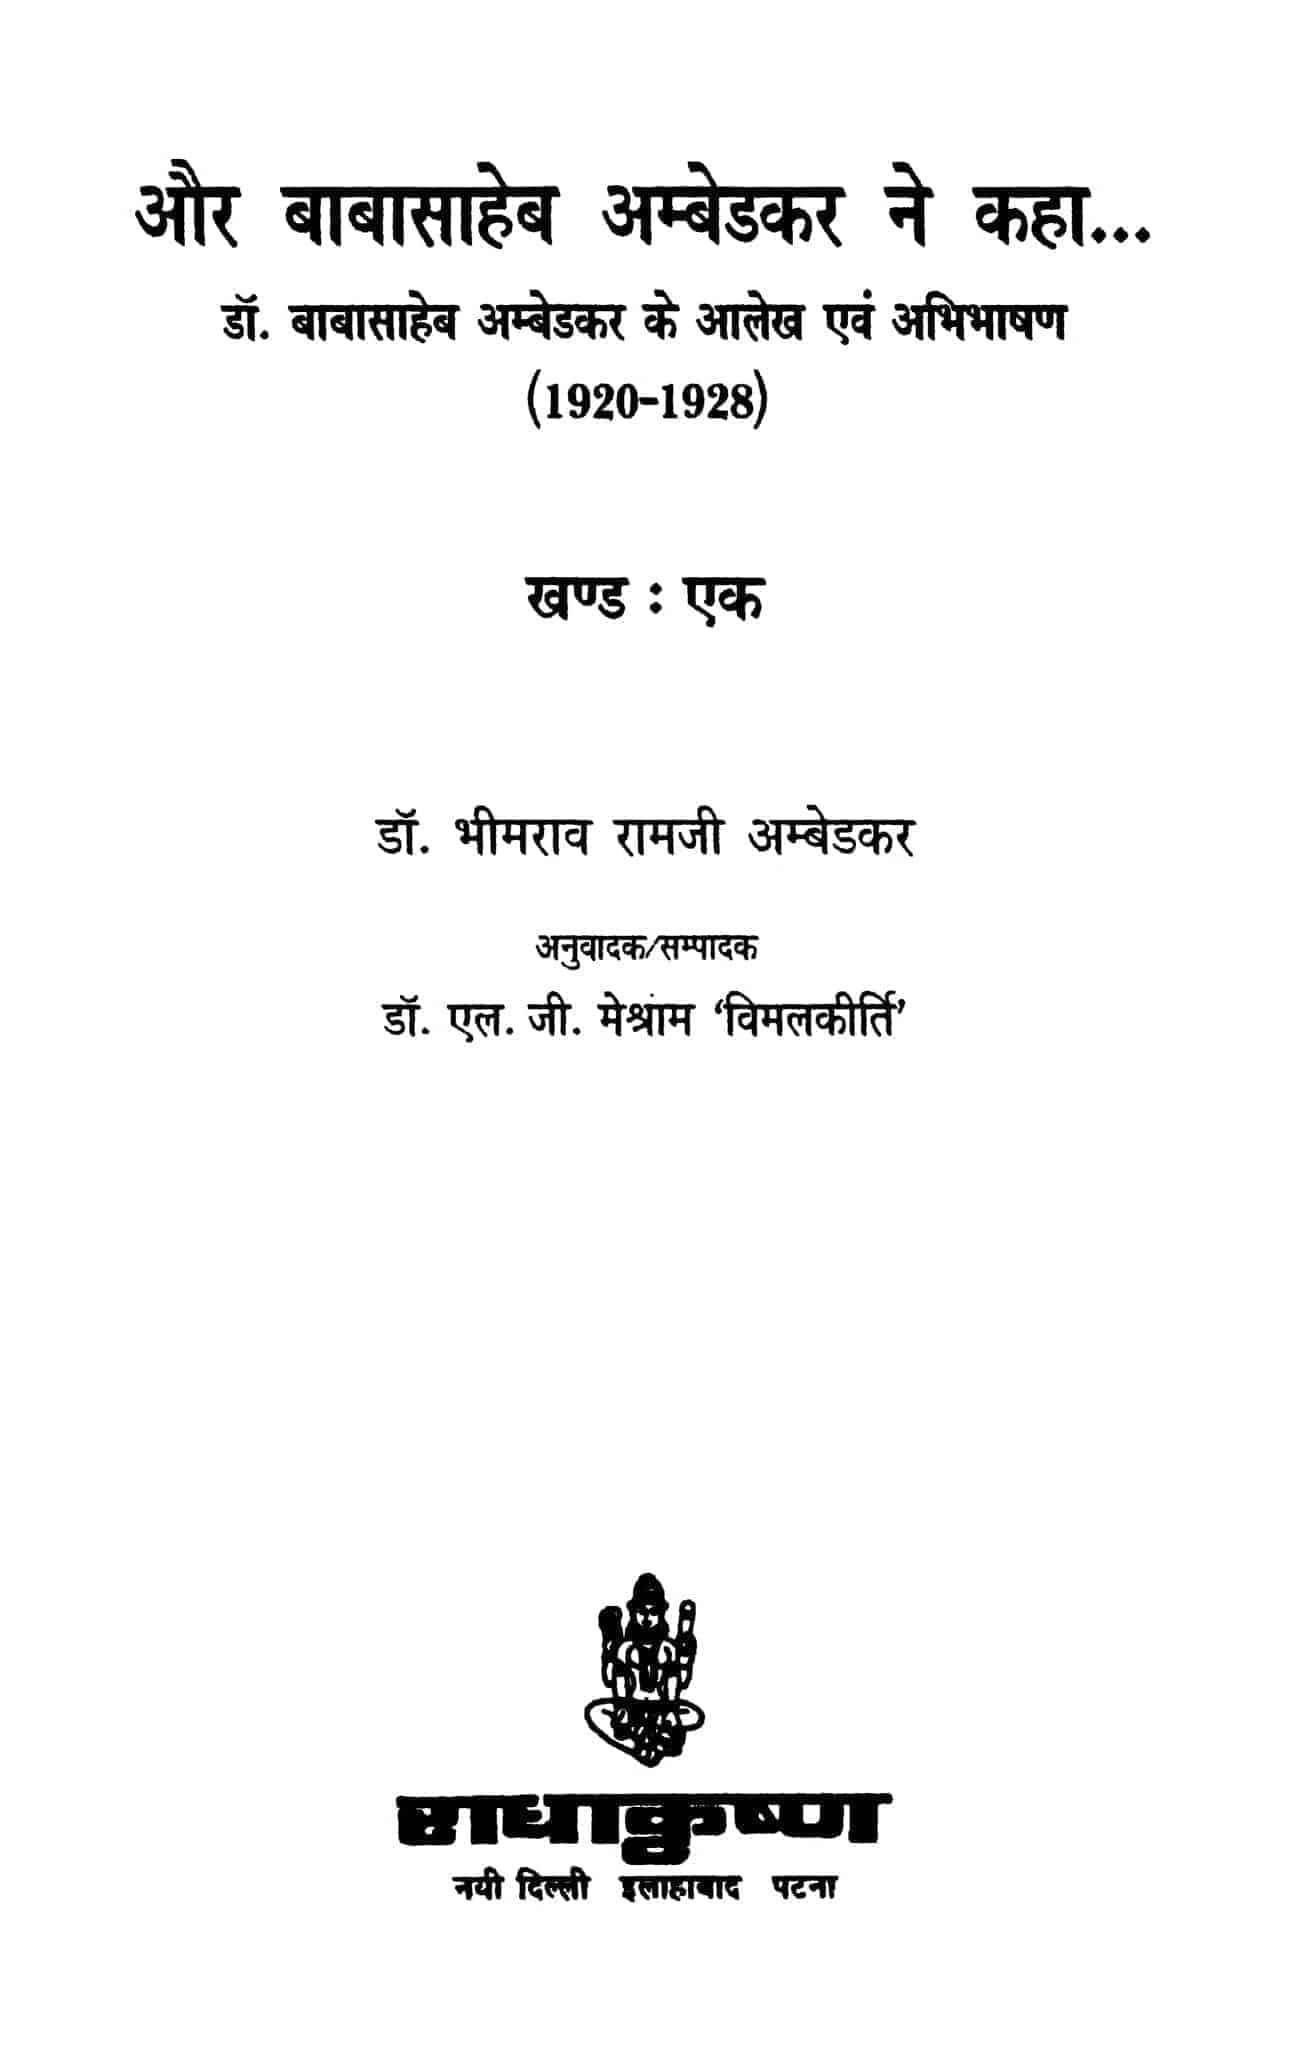 Book Image : और बाबासाहेब अम्बेडकर ने कहा...... - Aur Babasaheb Ambedkar Ne Kaha Vol. 1